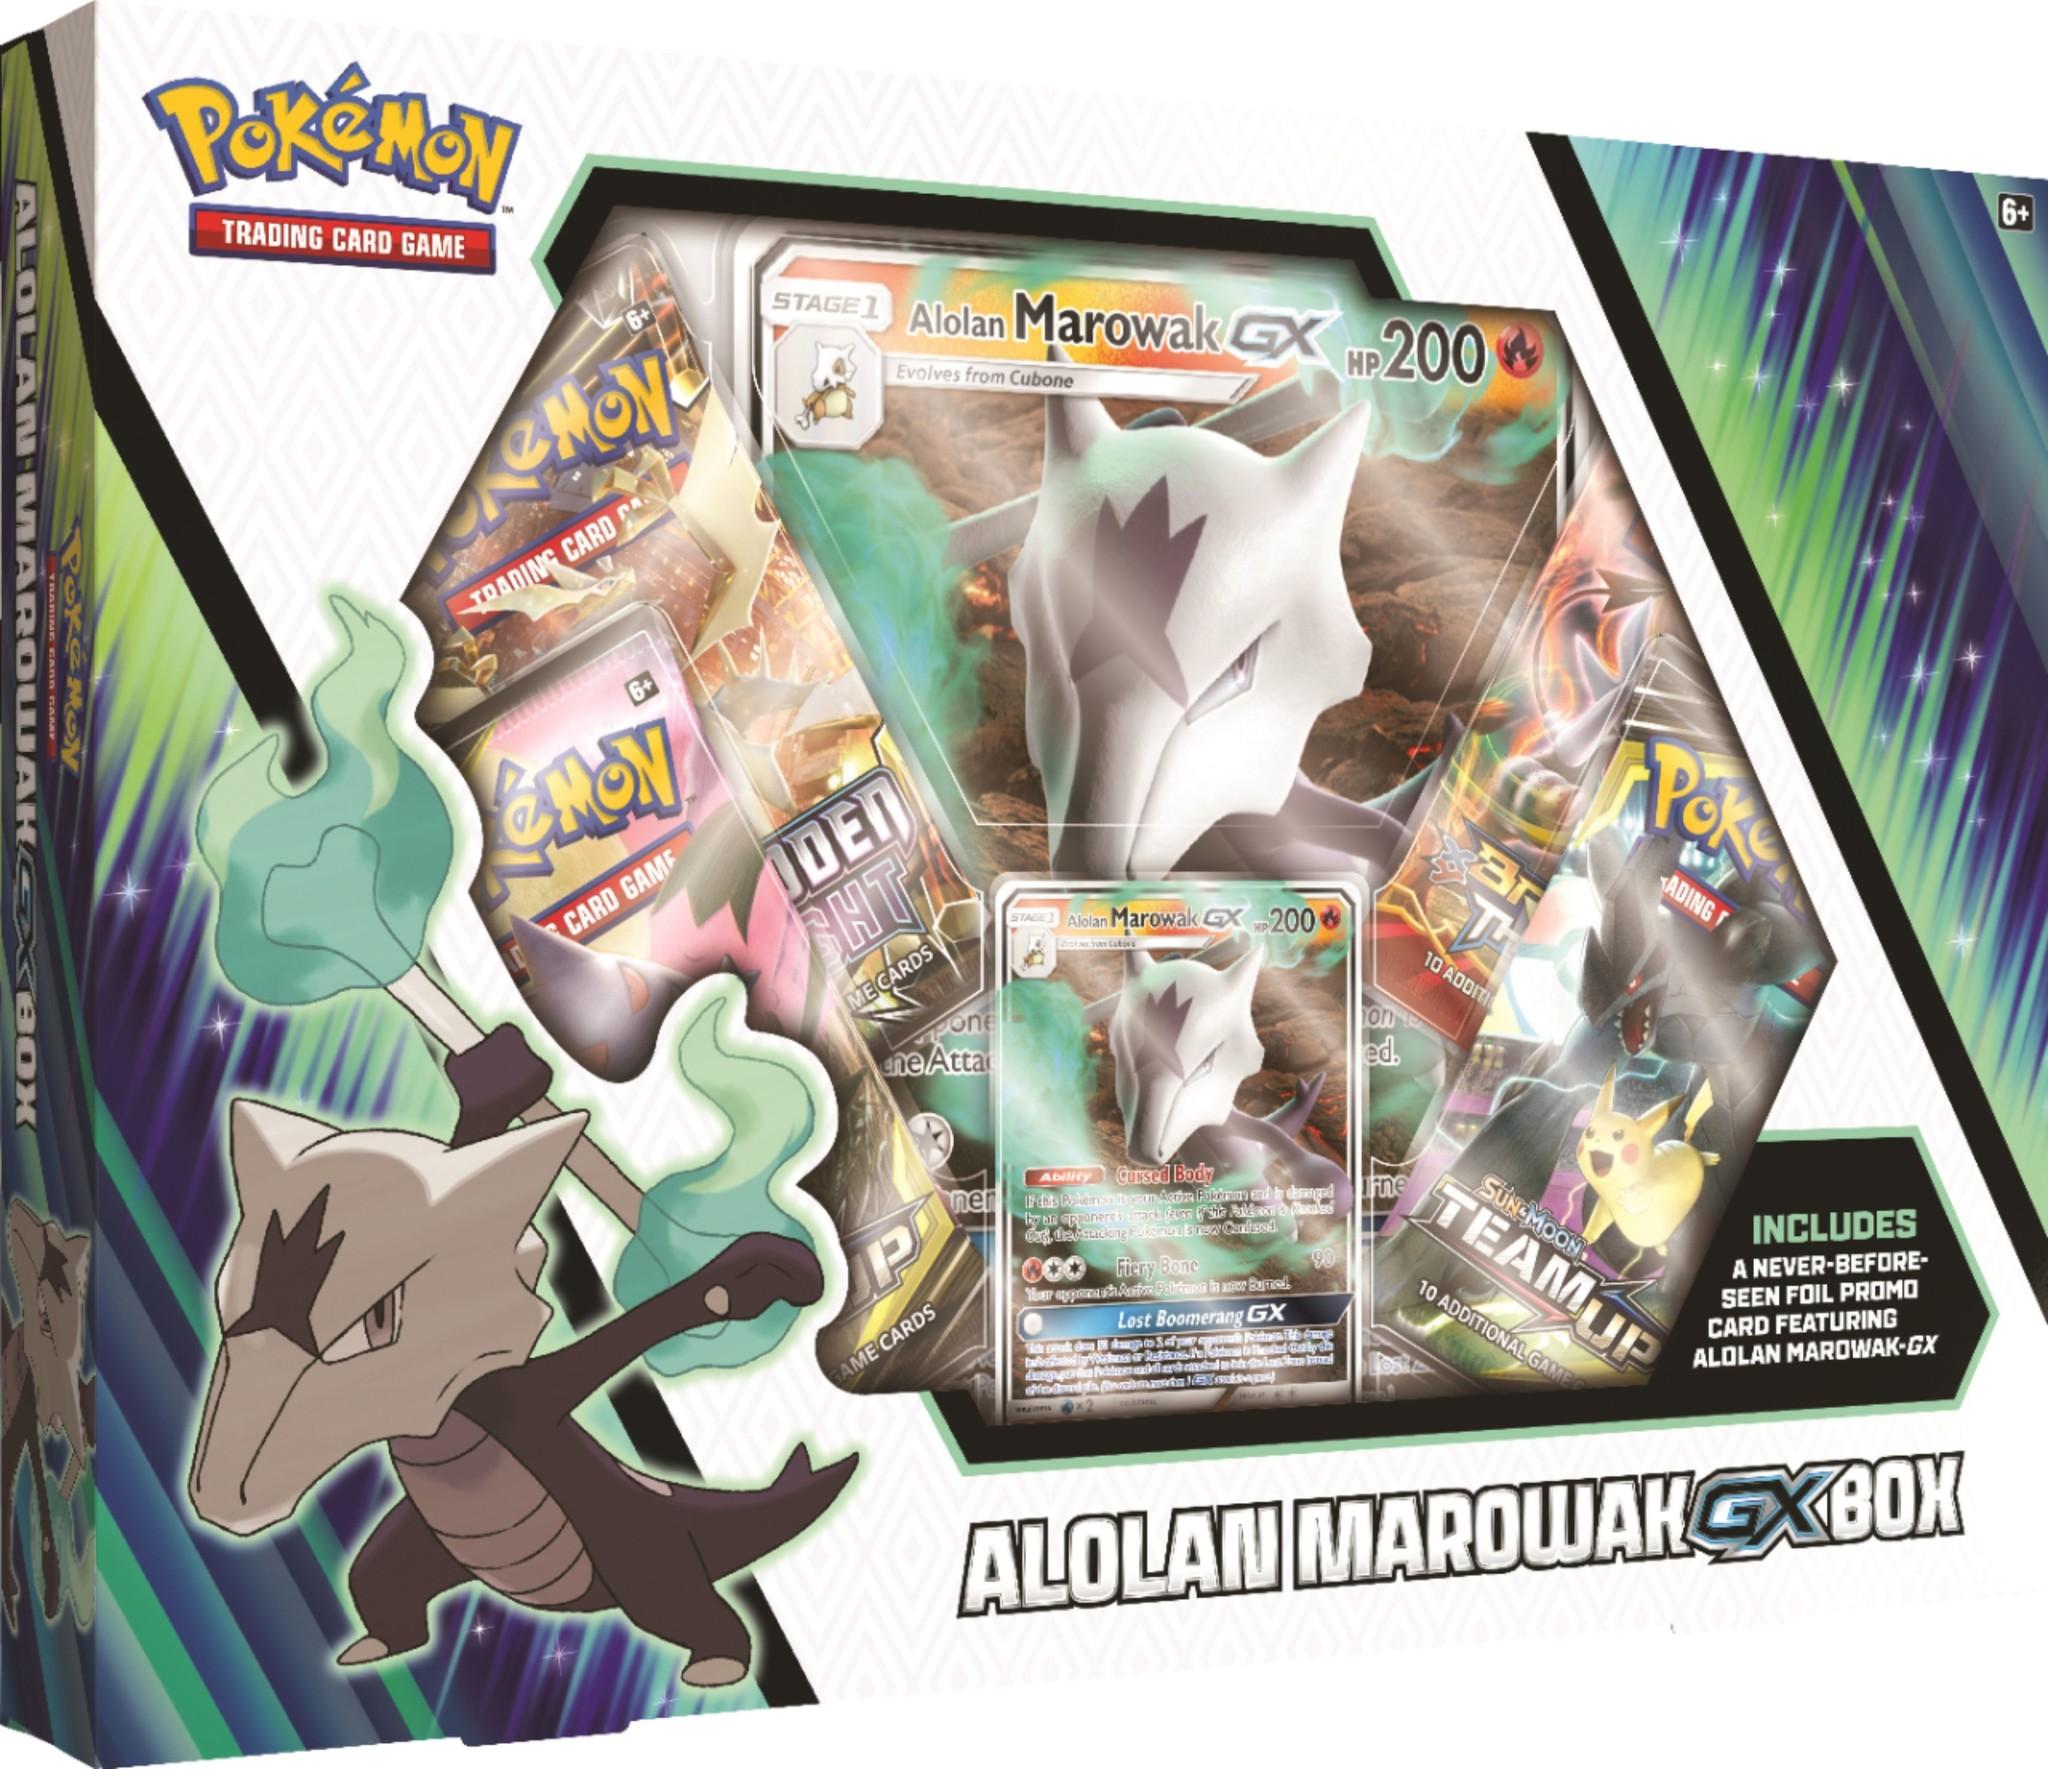 Pokemon USA POKEMON: ALOLAN MAROWAK GX BOX